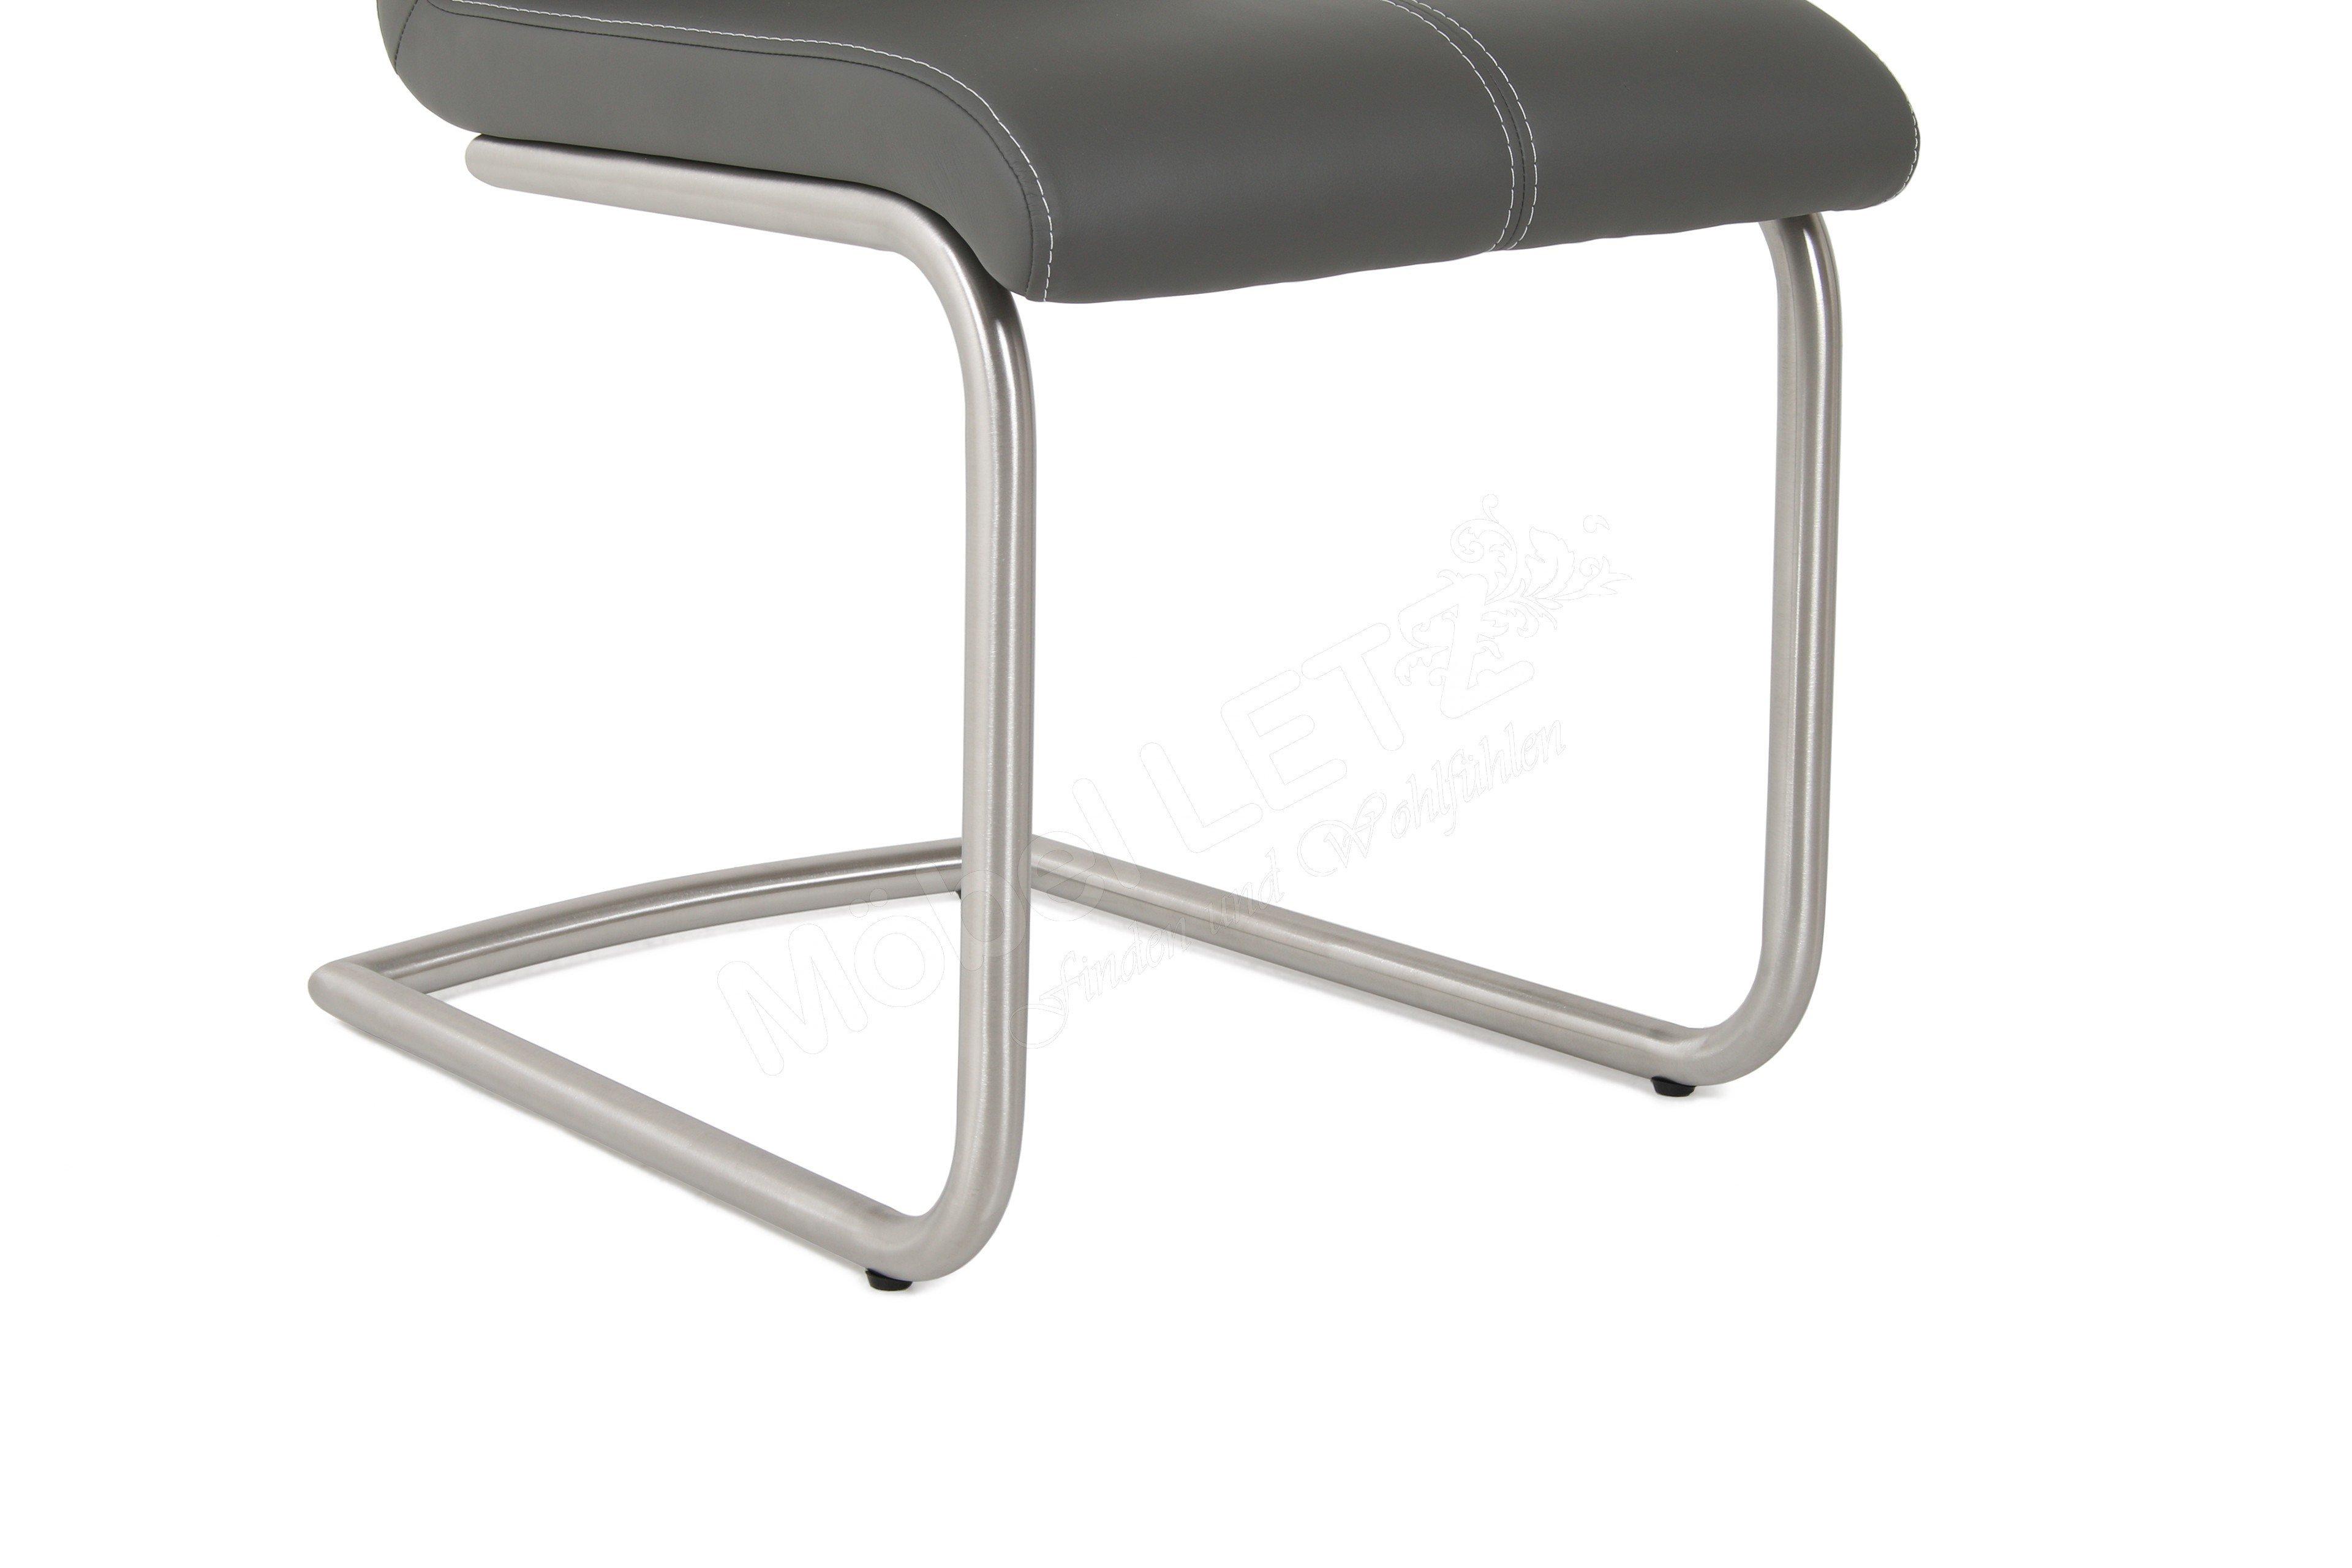 Mwa aktuell stuhl milano maximo ausf hrung h m bel letz for Stuhl edelstahl